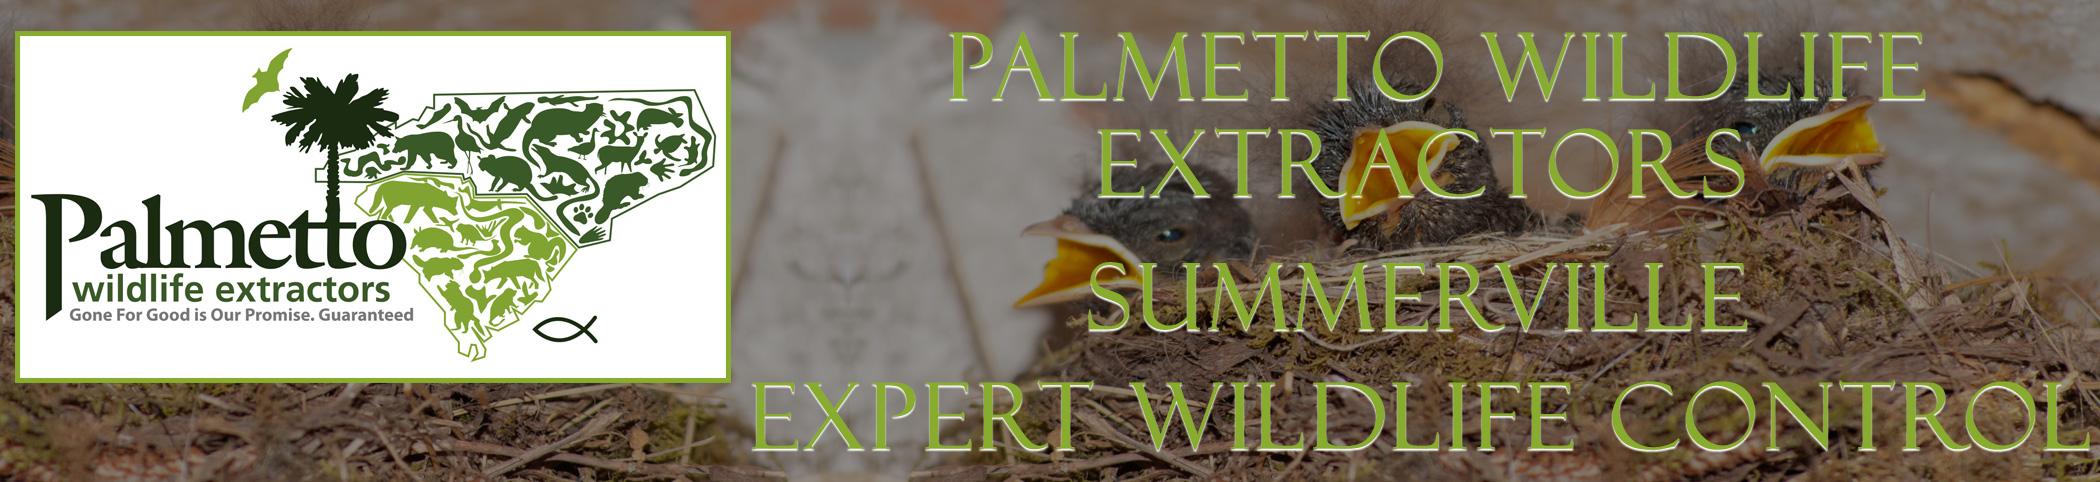 Palmetto Wildlife Extractors Summerville South Carolina header image